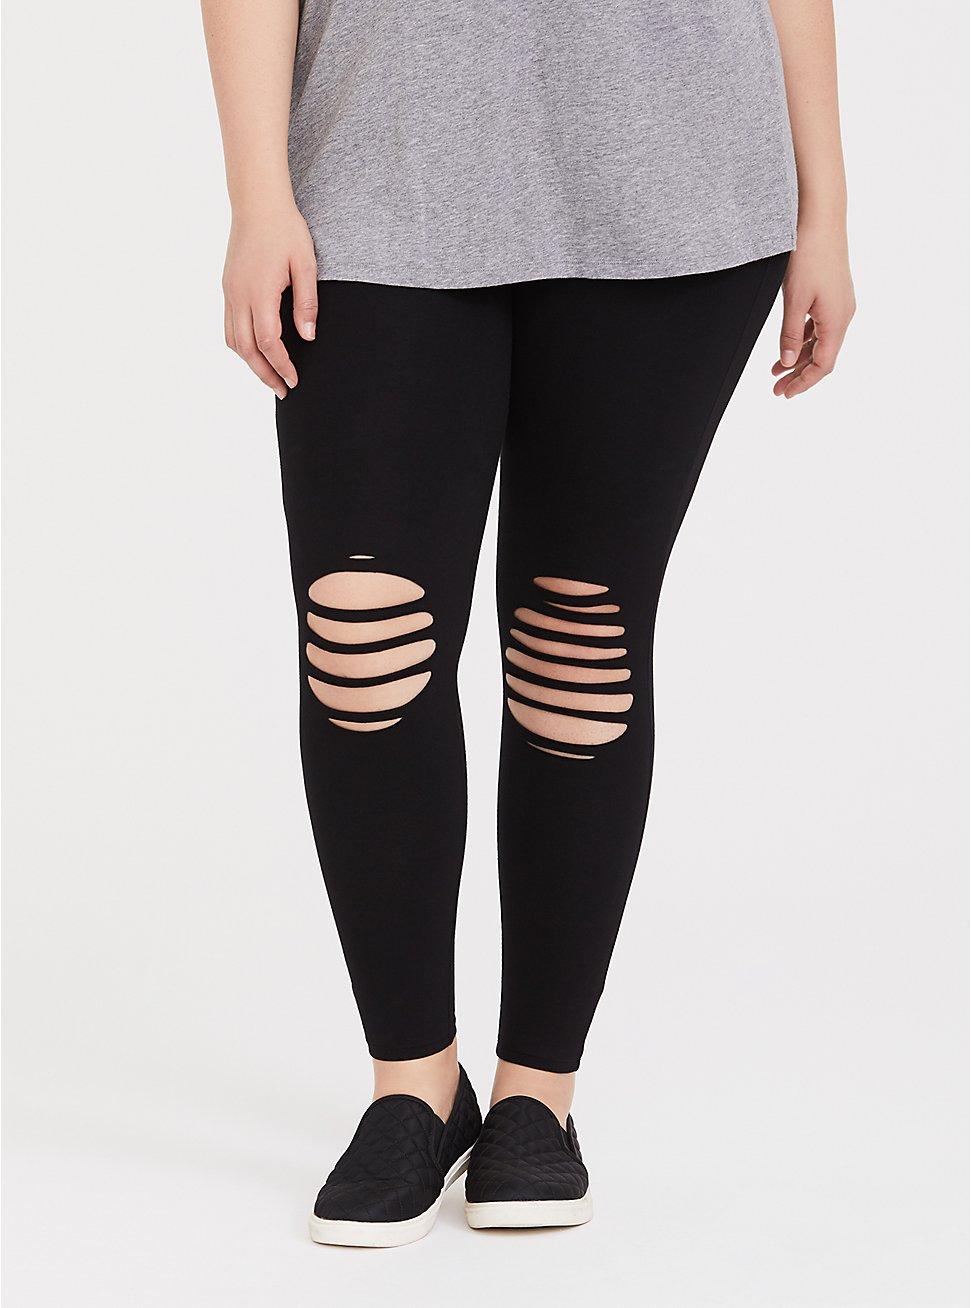 Premium Legging  - Slashed Knee Black, BLACK, hi-res